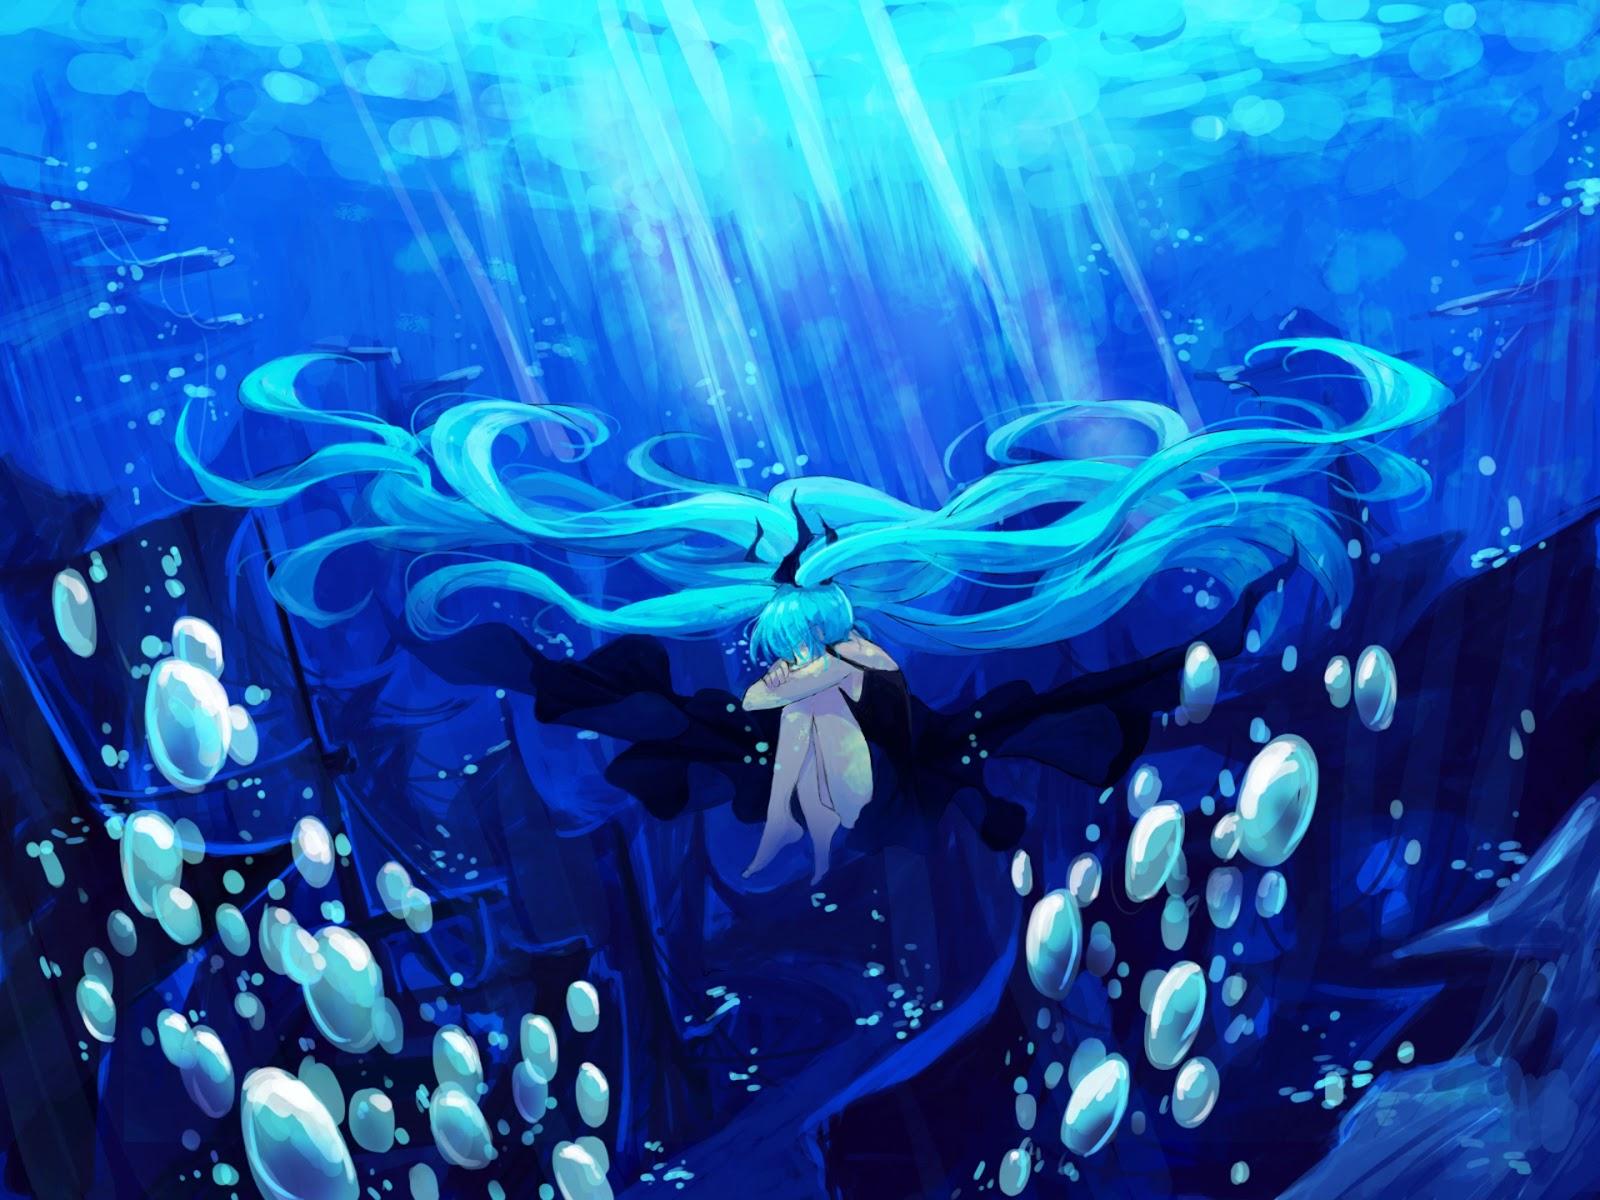 Hatsune Twin Tail Underwater Bubbles Vocaloid Anime Girl HD Wallpaper 1600x1200